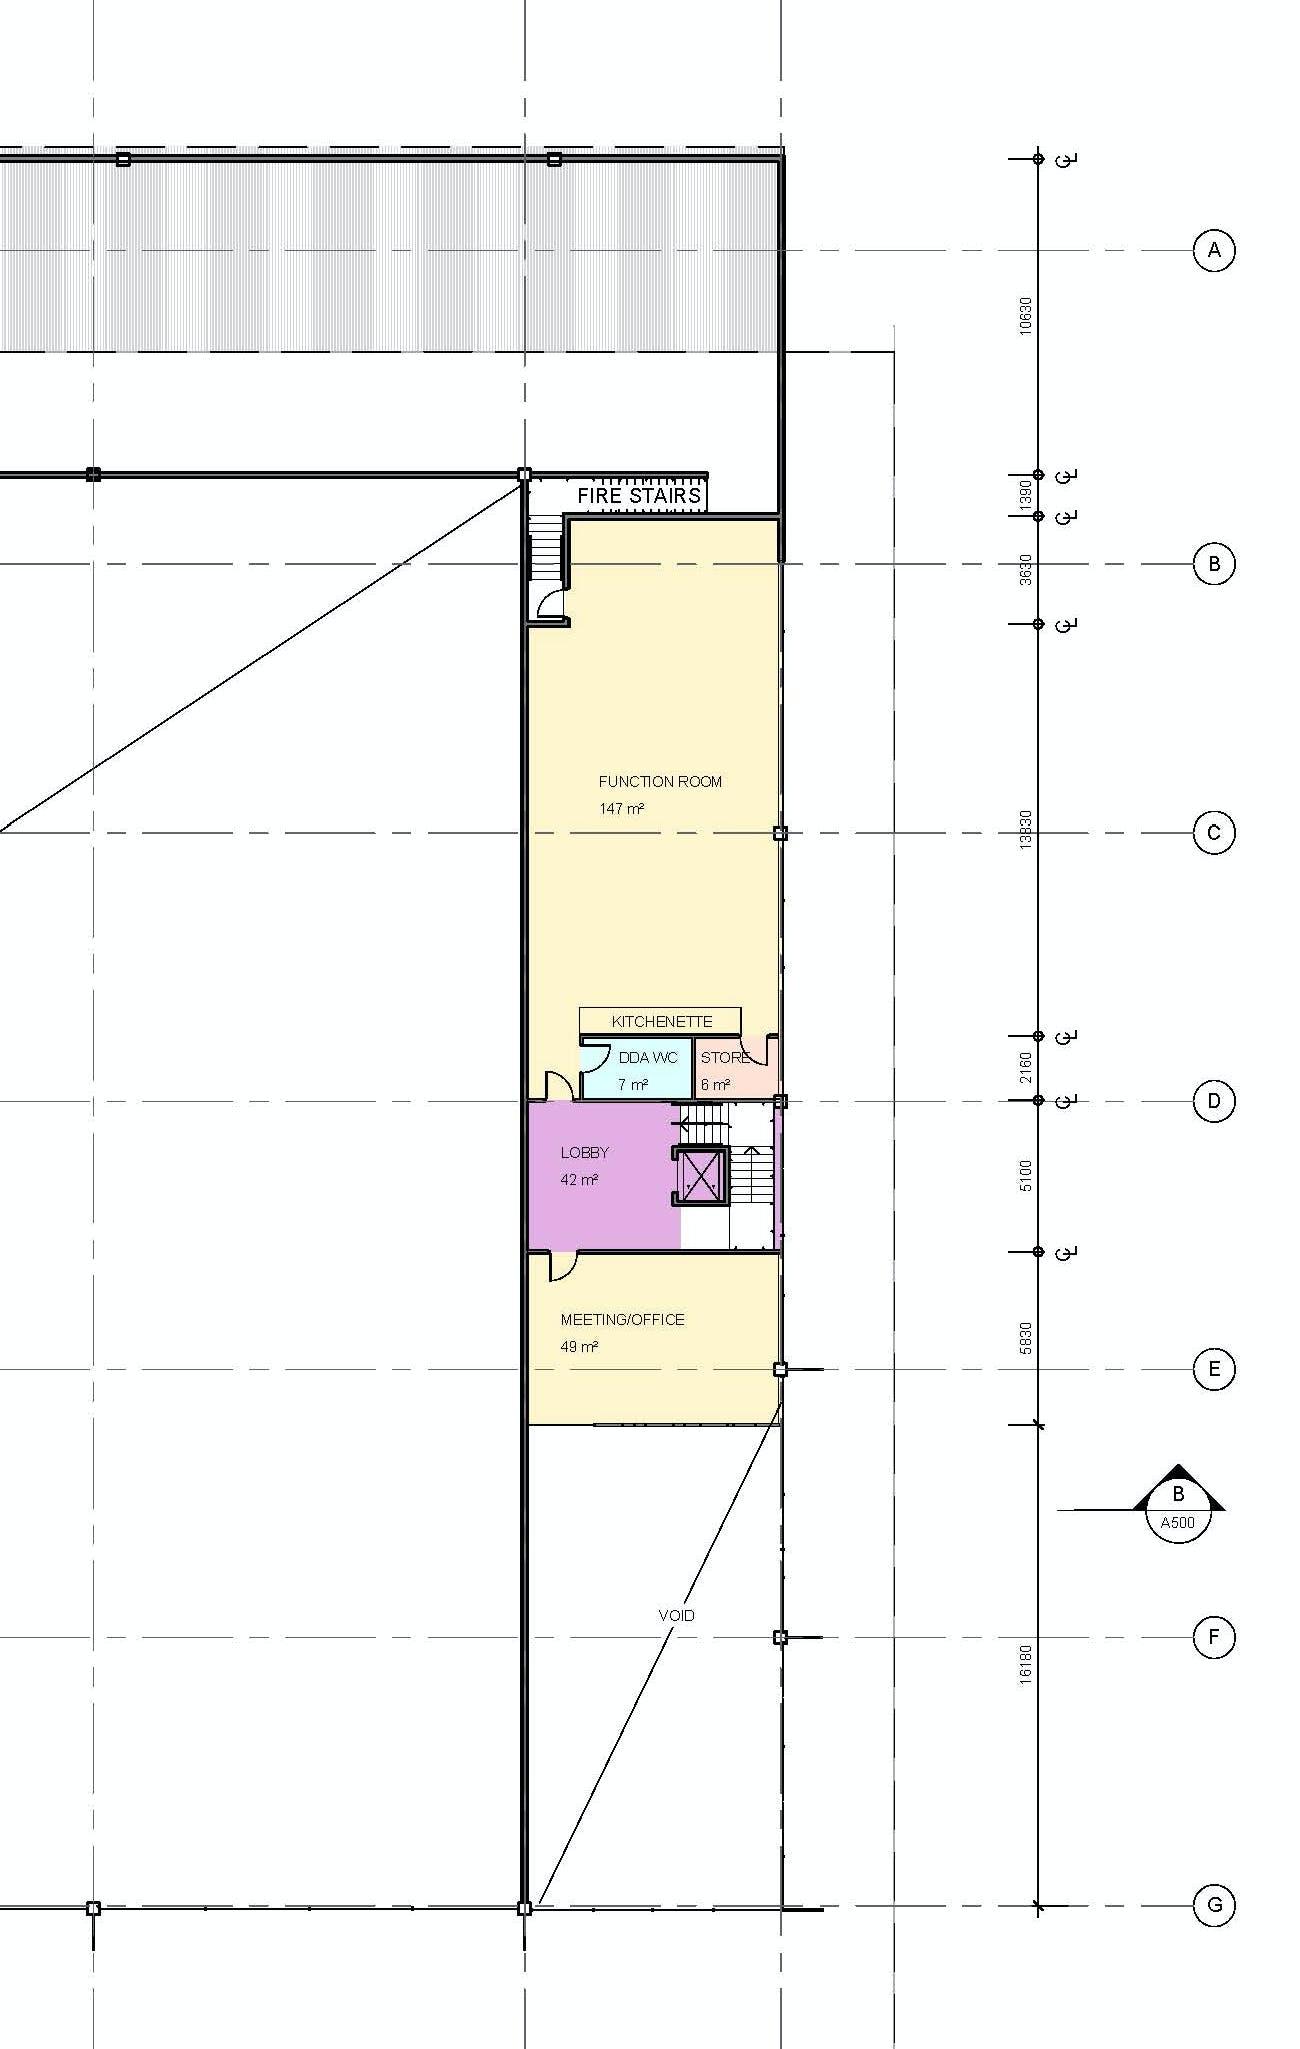 Marrara Netball Centre Drawings 05 Zoom A